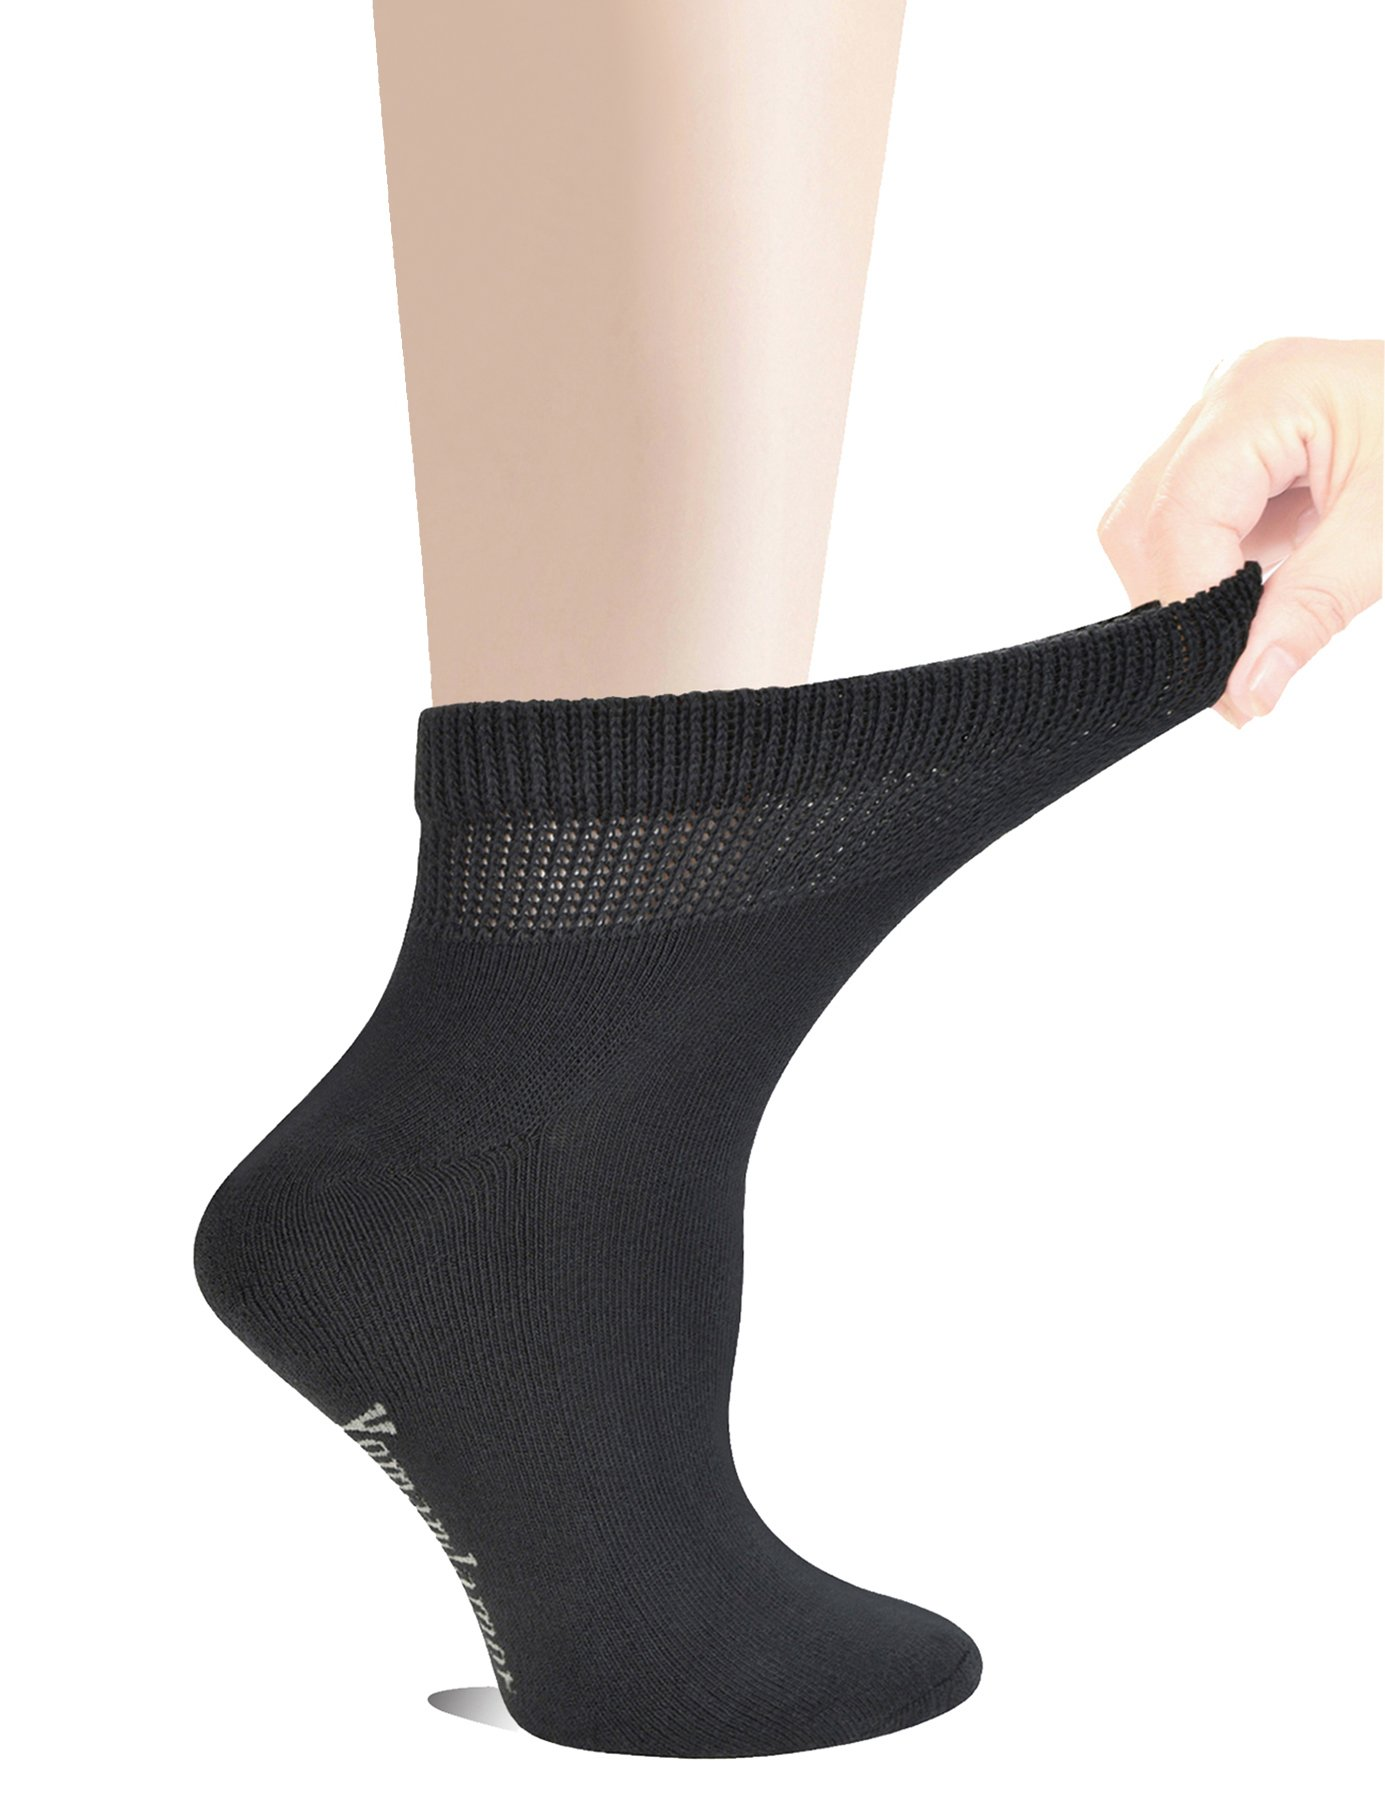 7cb800acf Yomandamor Women s 5 Pairs Non-Binding Cotton Ankle Diabetic Dress Socks  with Seamless Toe